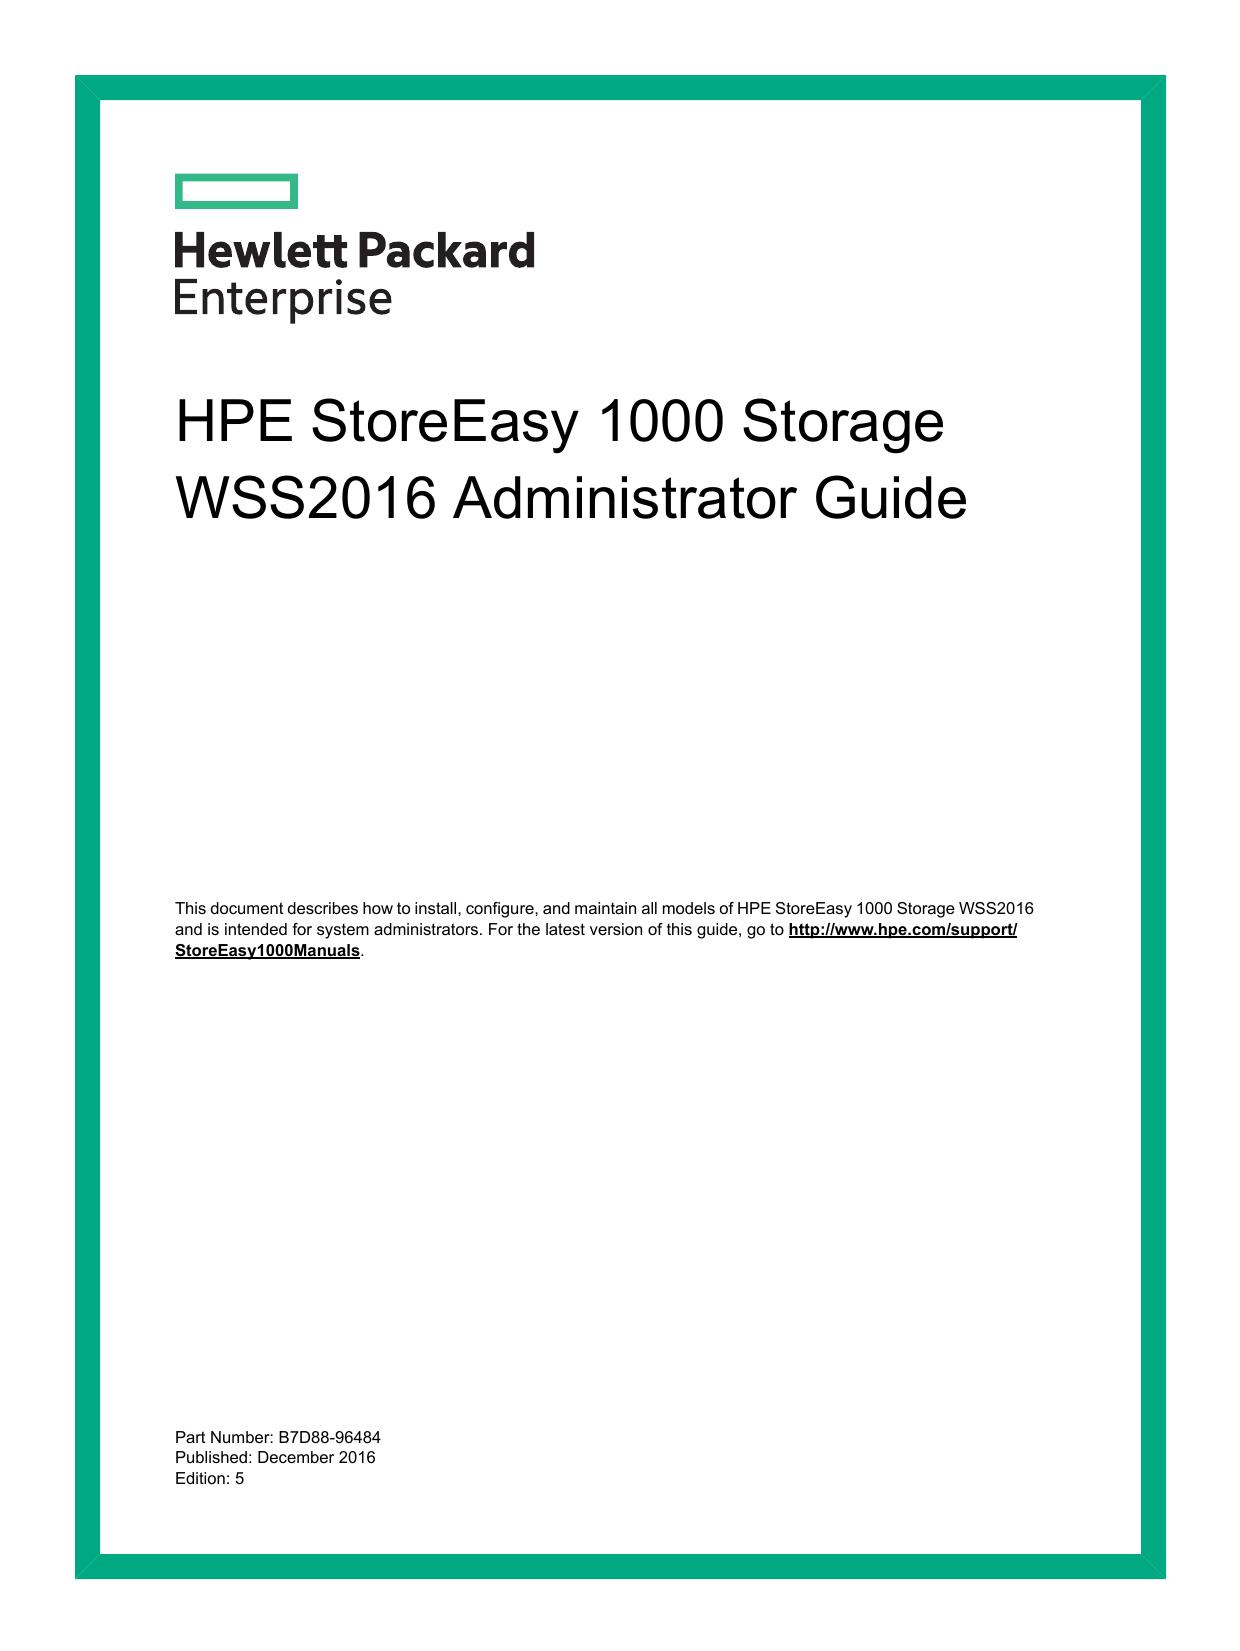 HPE StoreEasy 1000 Storage WSS2016 Administrator Guide